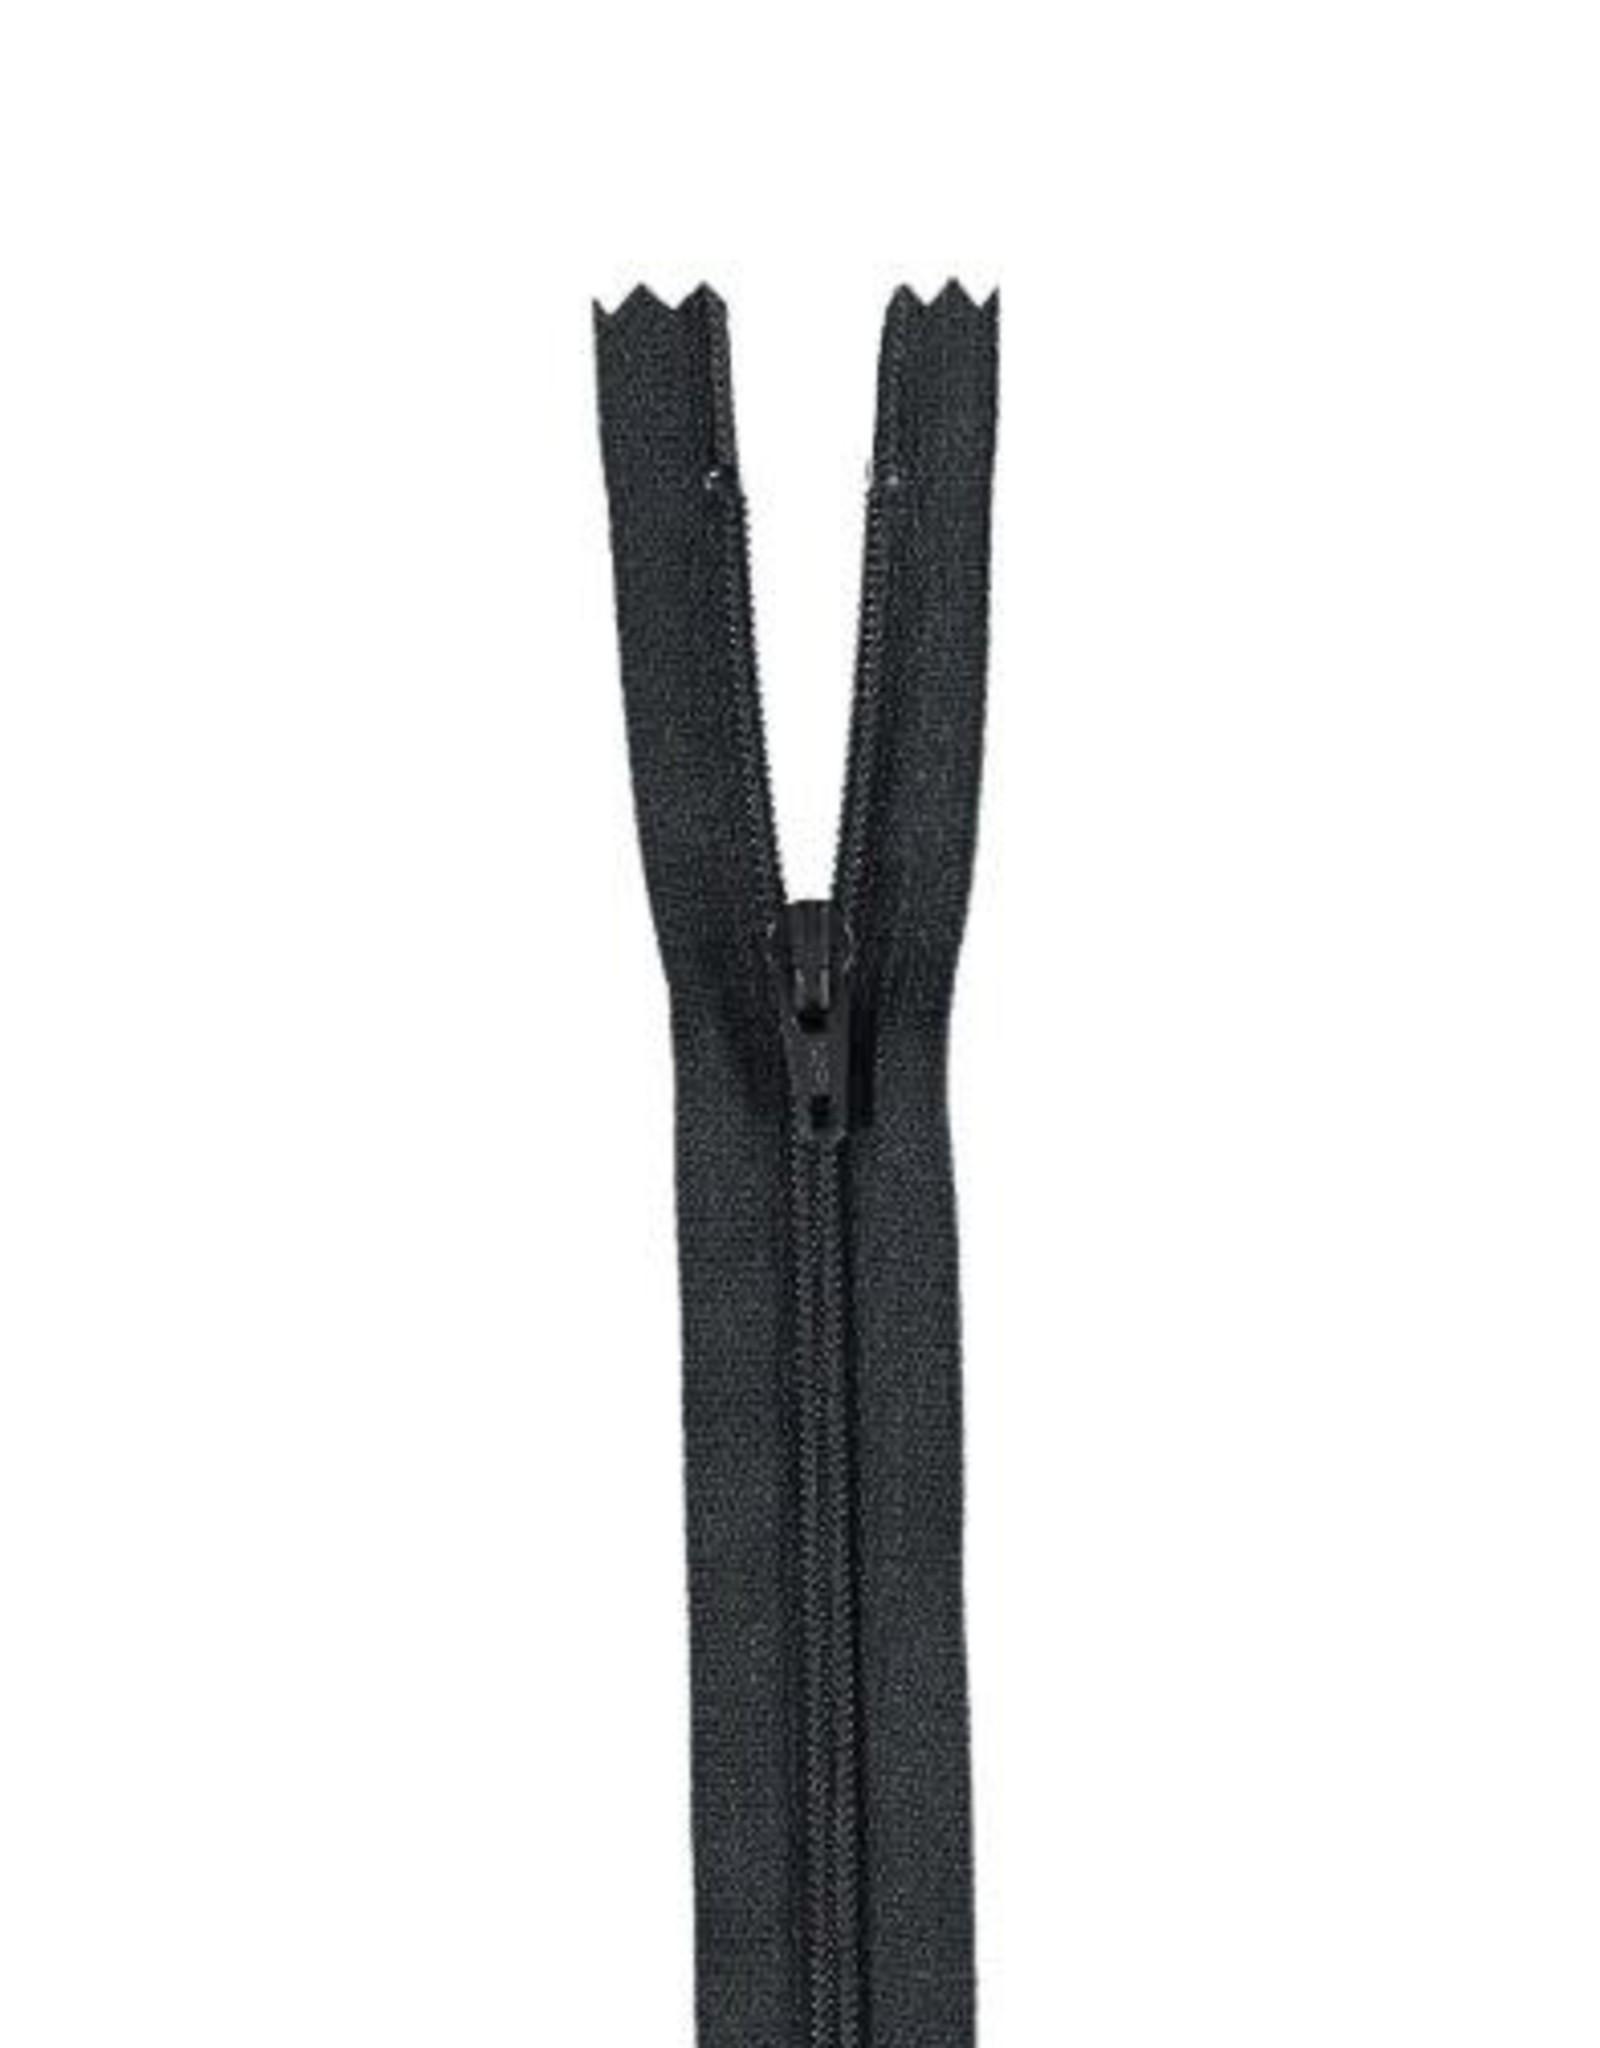 YKK Spiraalrits niet-DB 3mm antraciet 156-45cm